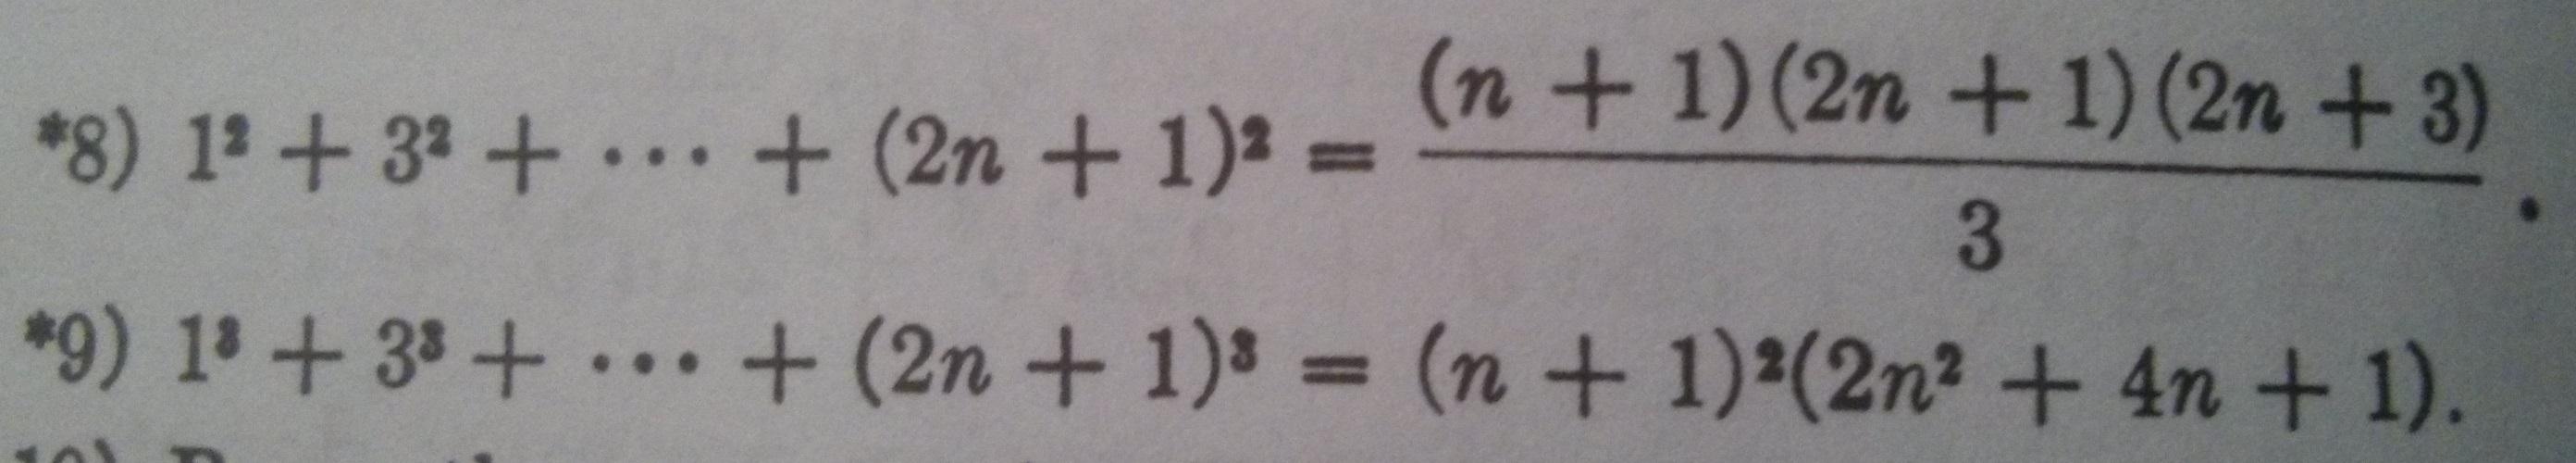 Name:  maths 002.jpg Views: 91 Size:  309.4 KB